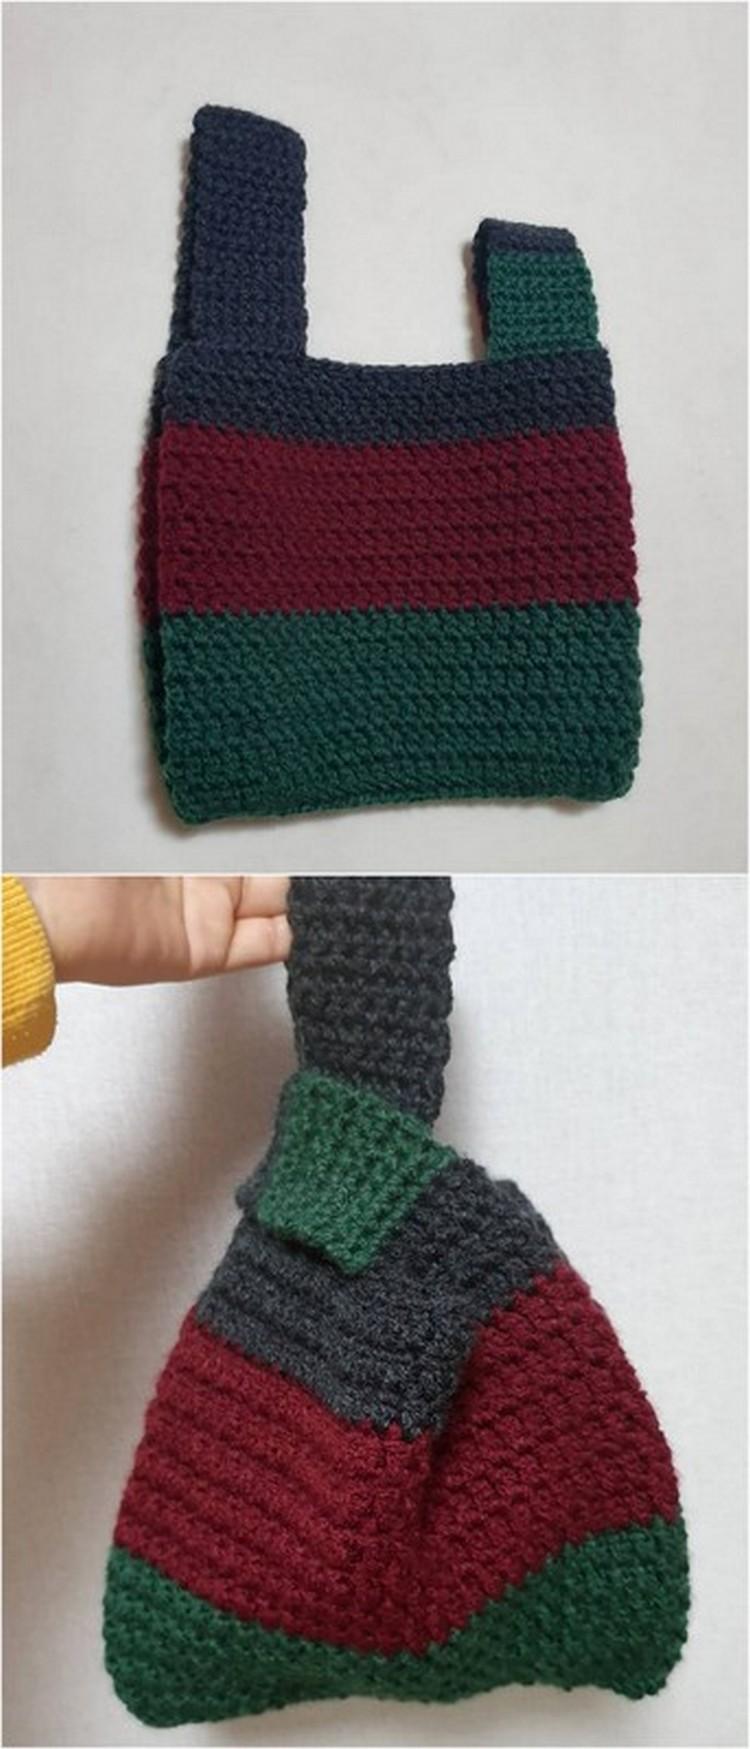 Unequal Striped Bag Free Crochet Pattern